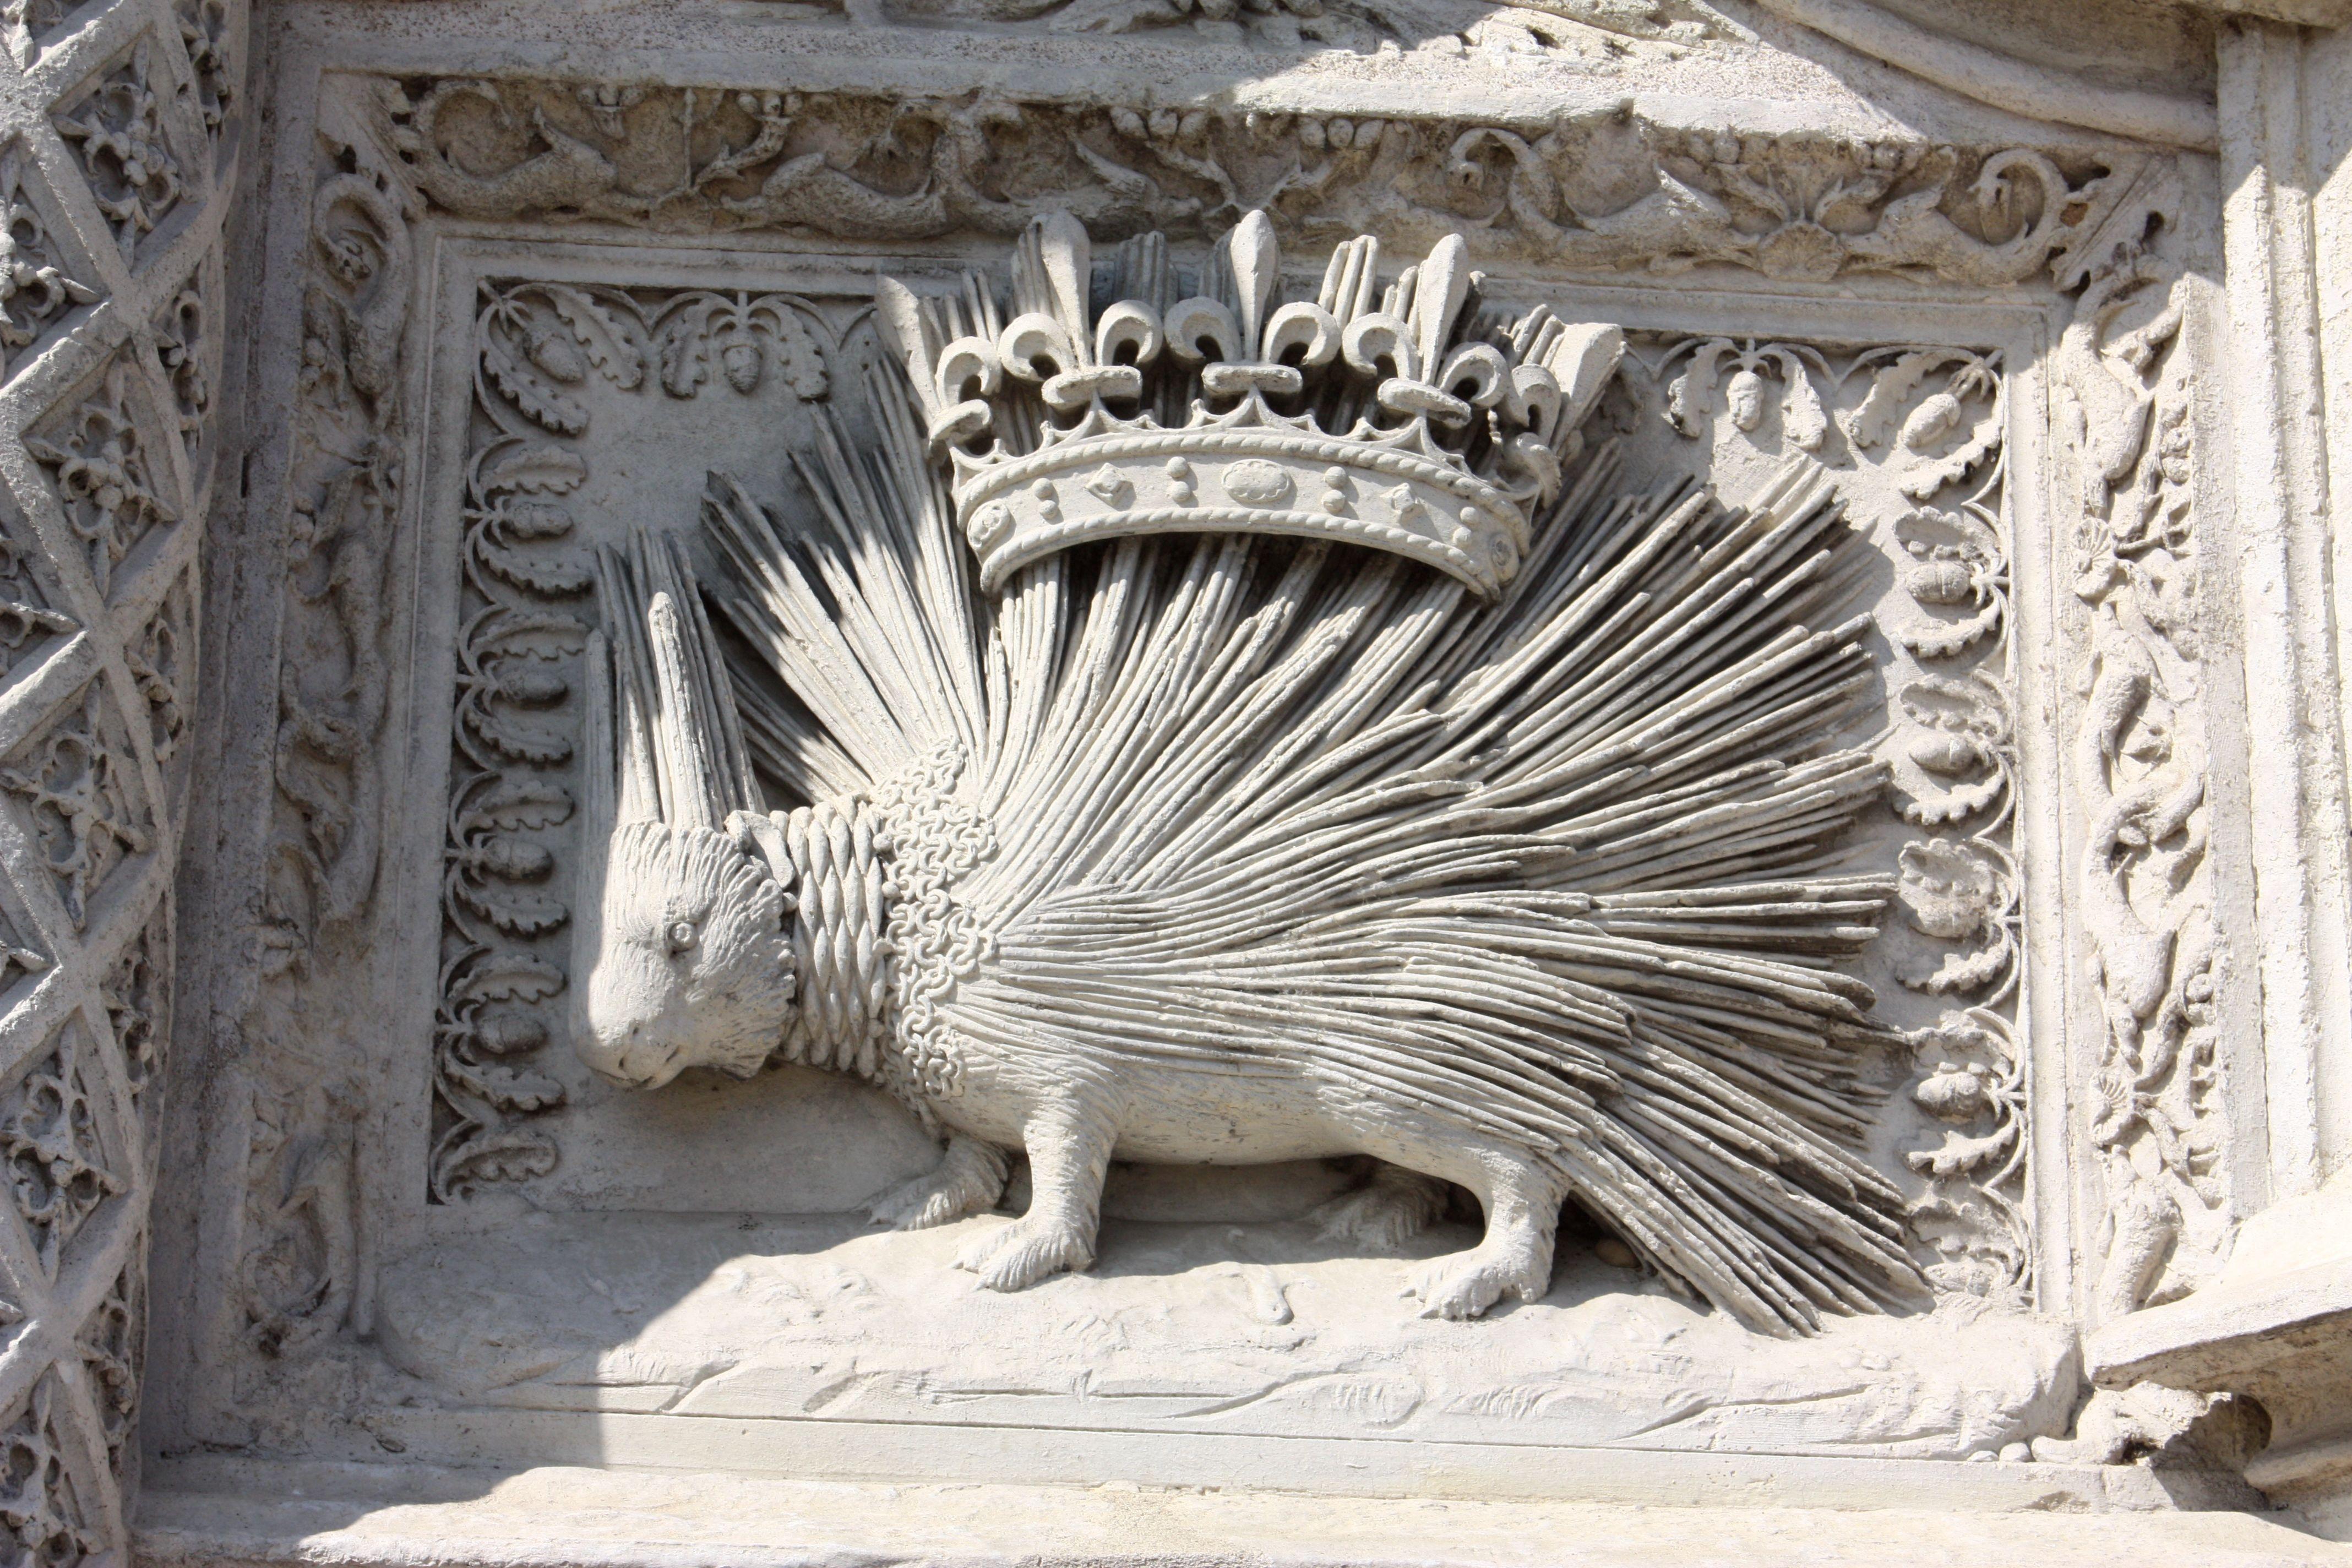 Porcupine stone work blois